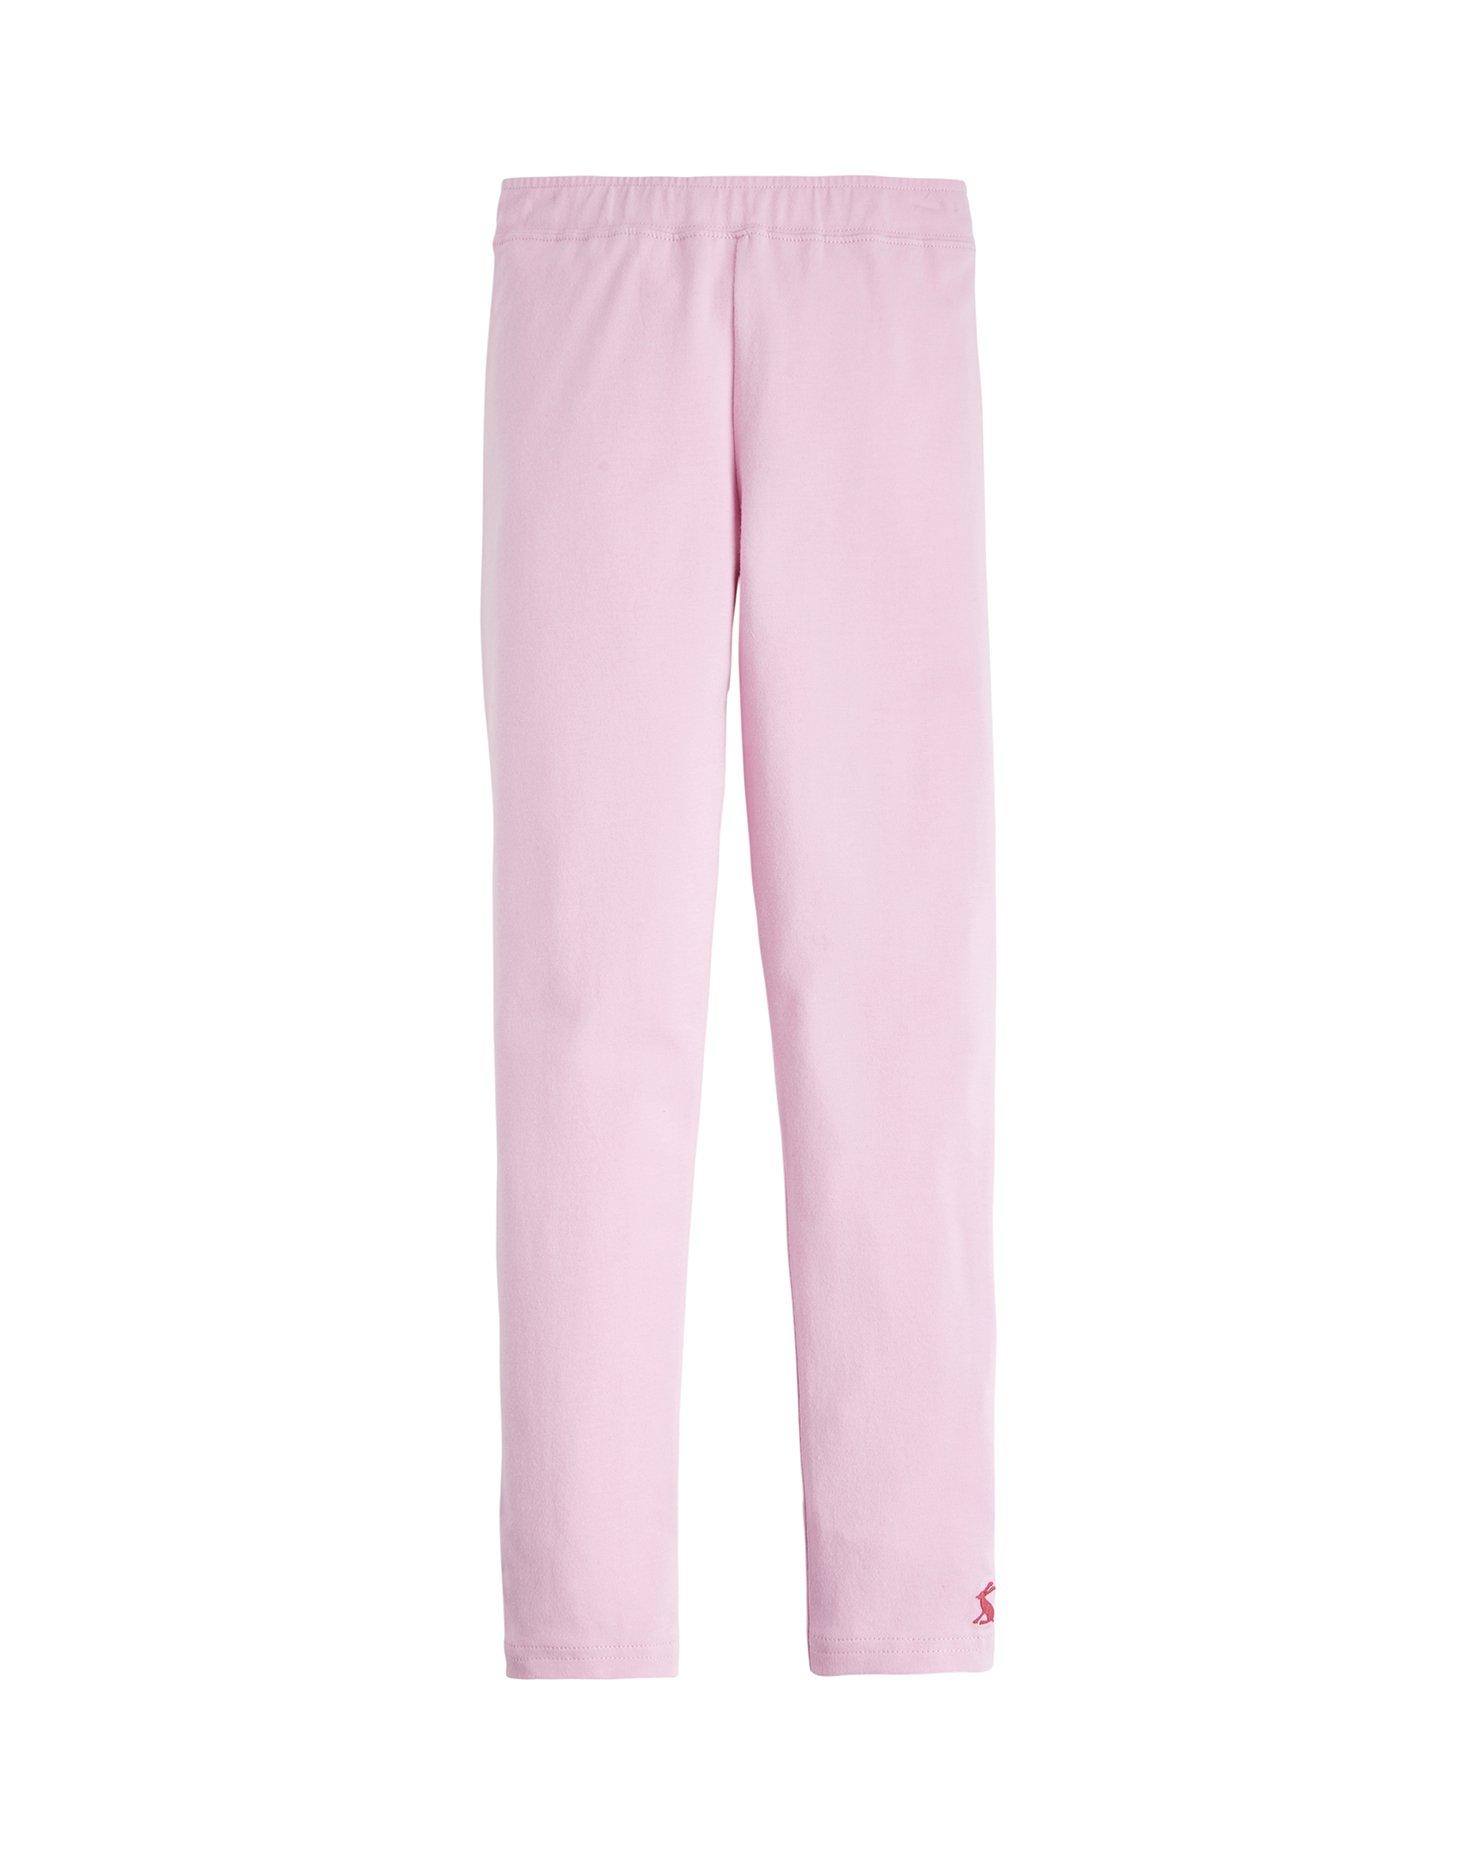 Joules Emilia Jersey Leggings - Dusk Pink - 1 Year - 80 cm